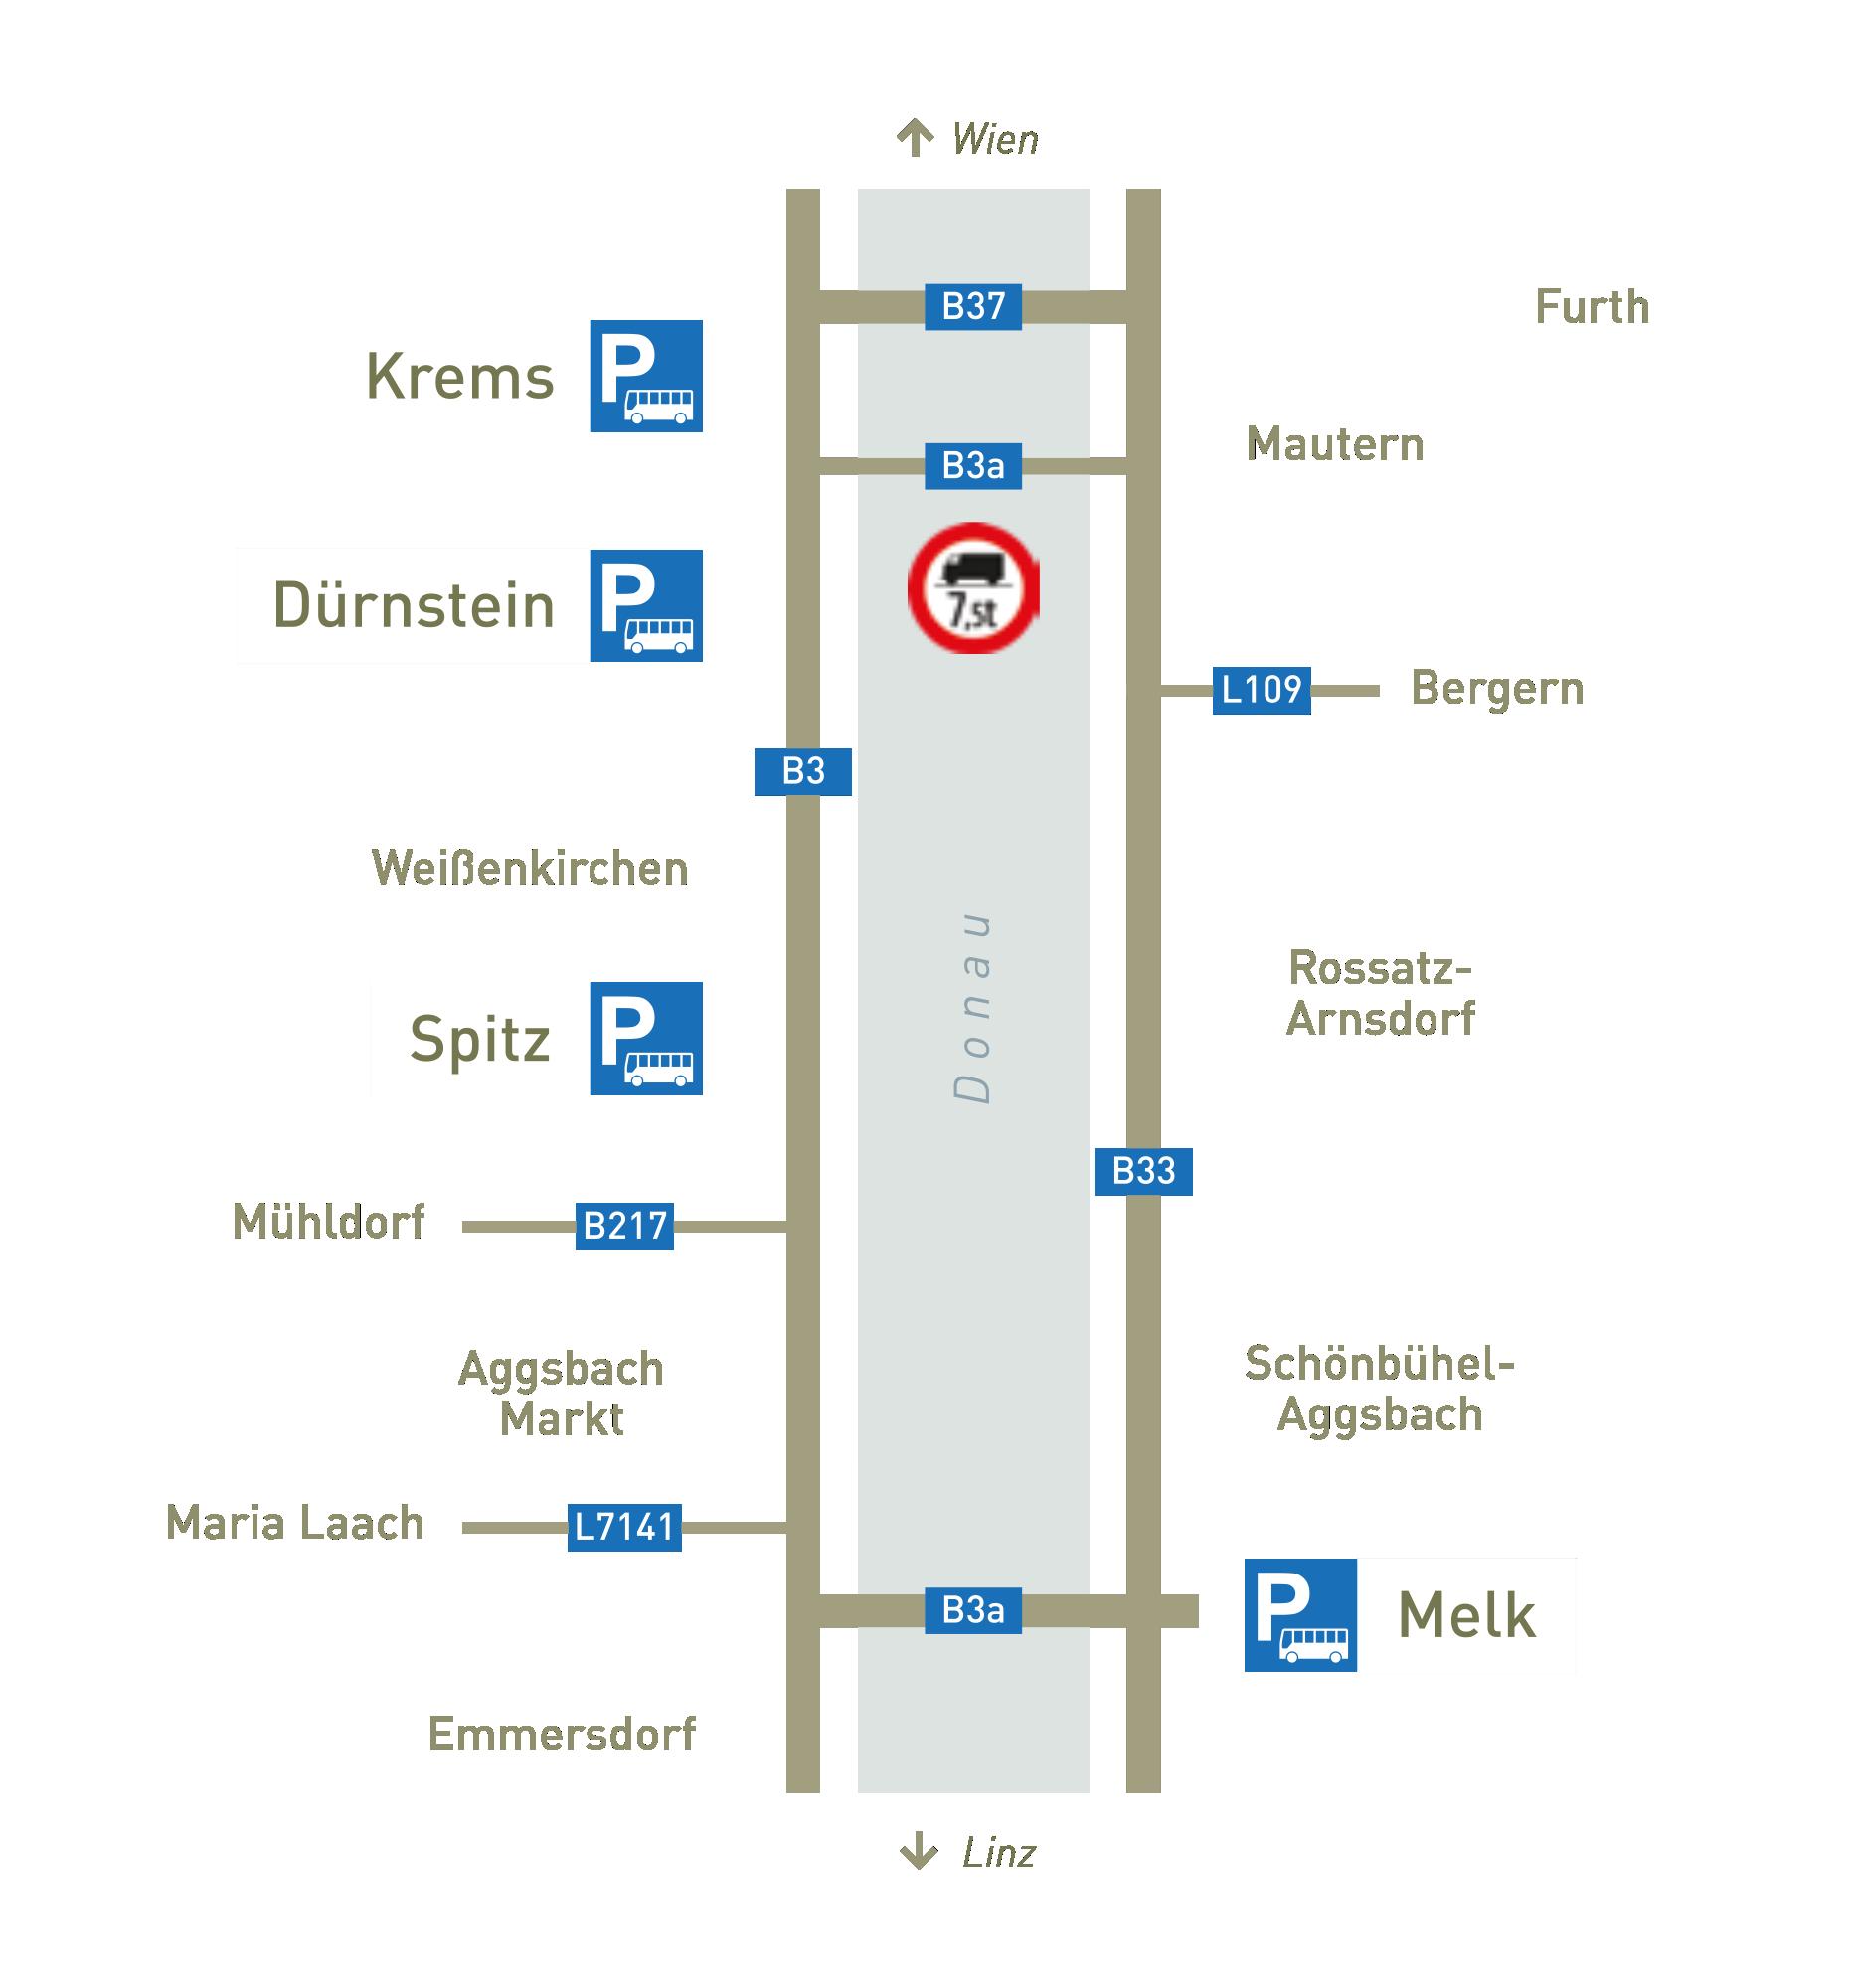 https://busparken-wachau.at/wp-content/uploads/2021/05/img-parkplatz-1.png